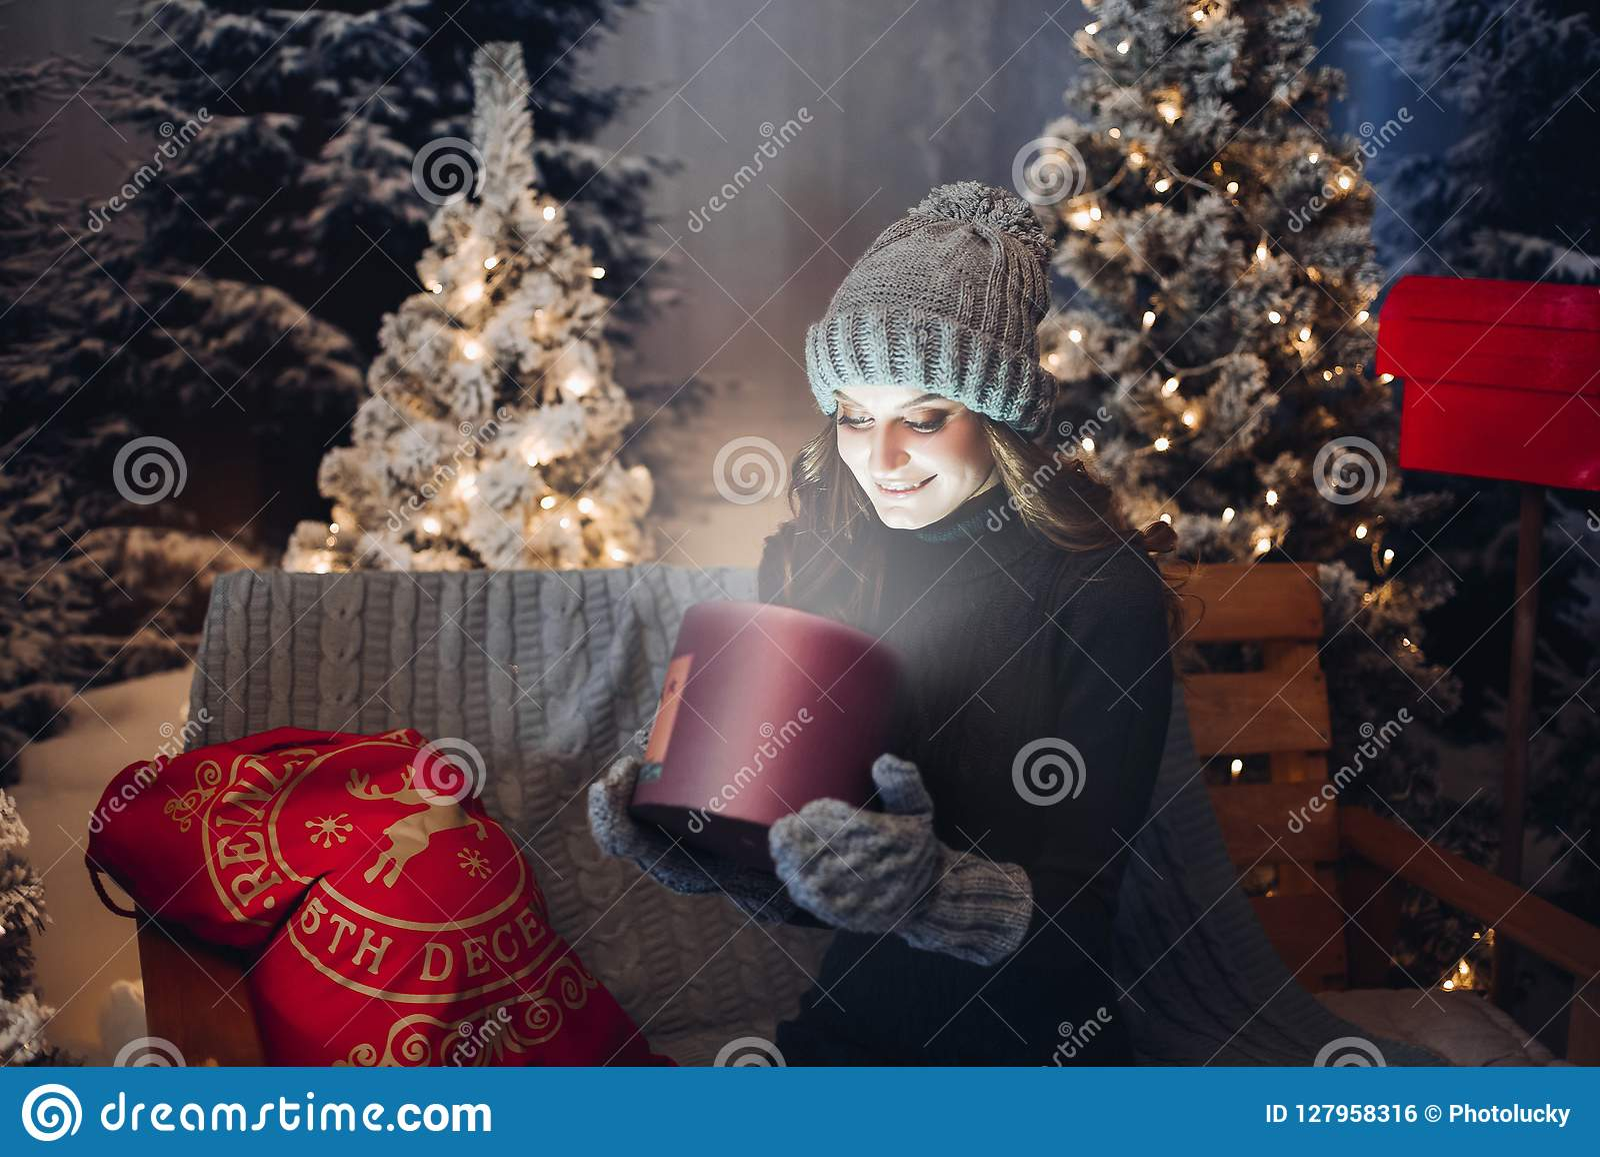 Beautiful girl opening magic box with present at Christmas night.